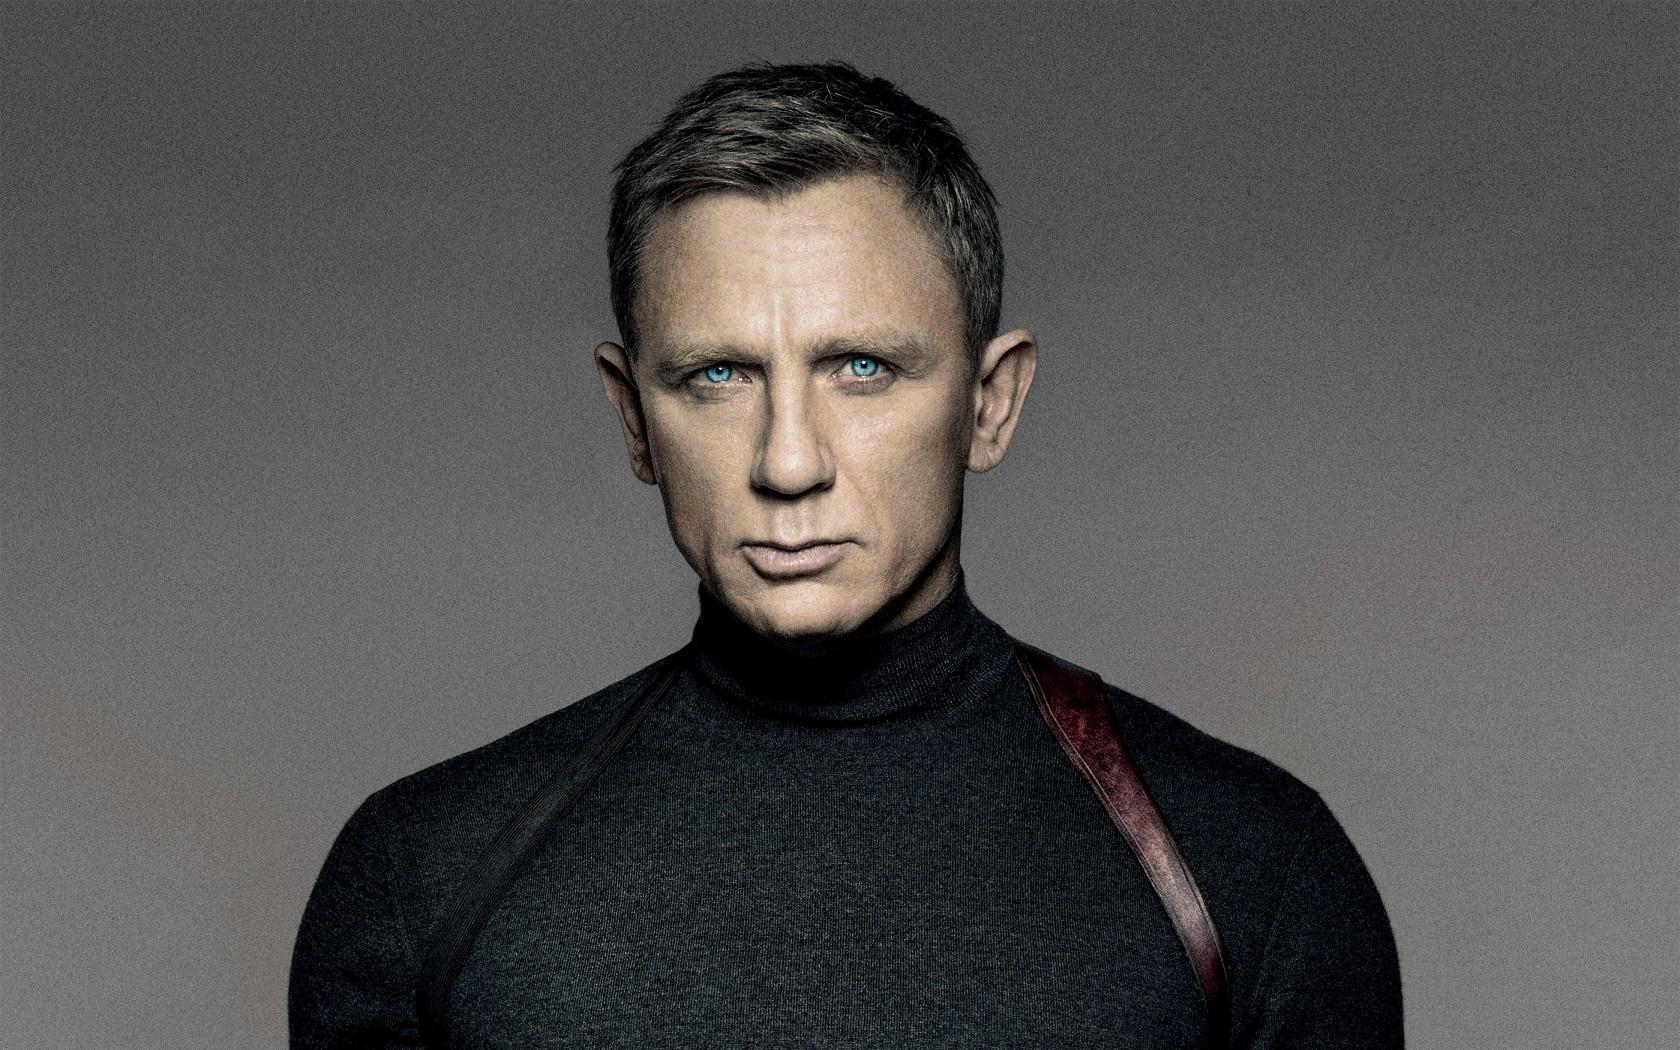 007 Spectre wallpaper 3